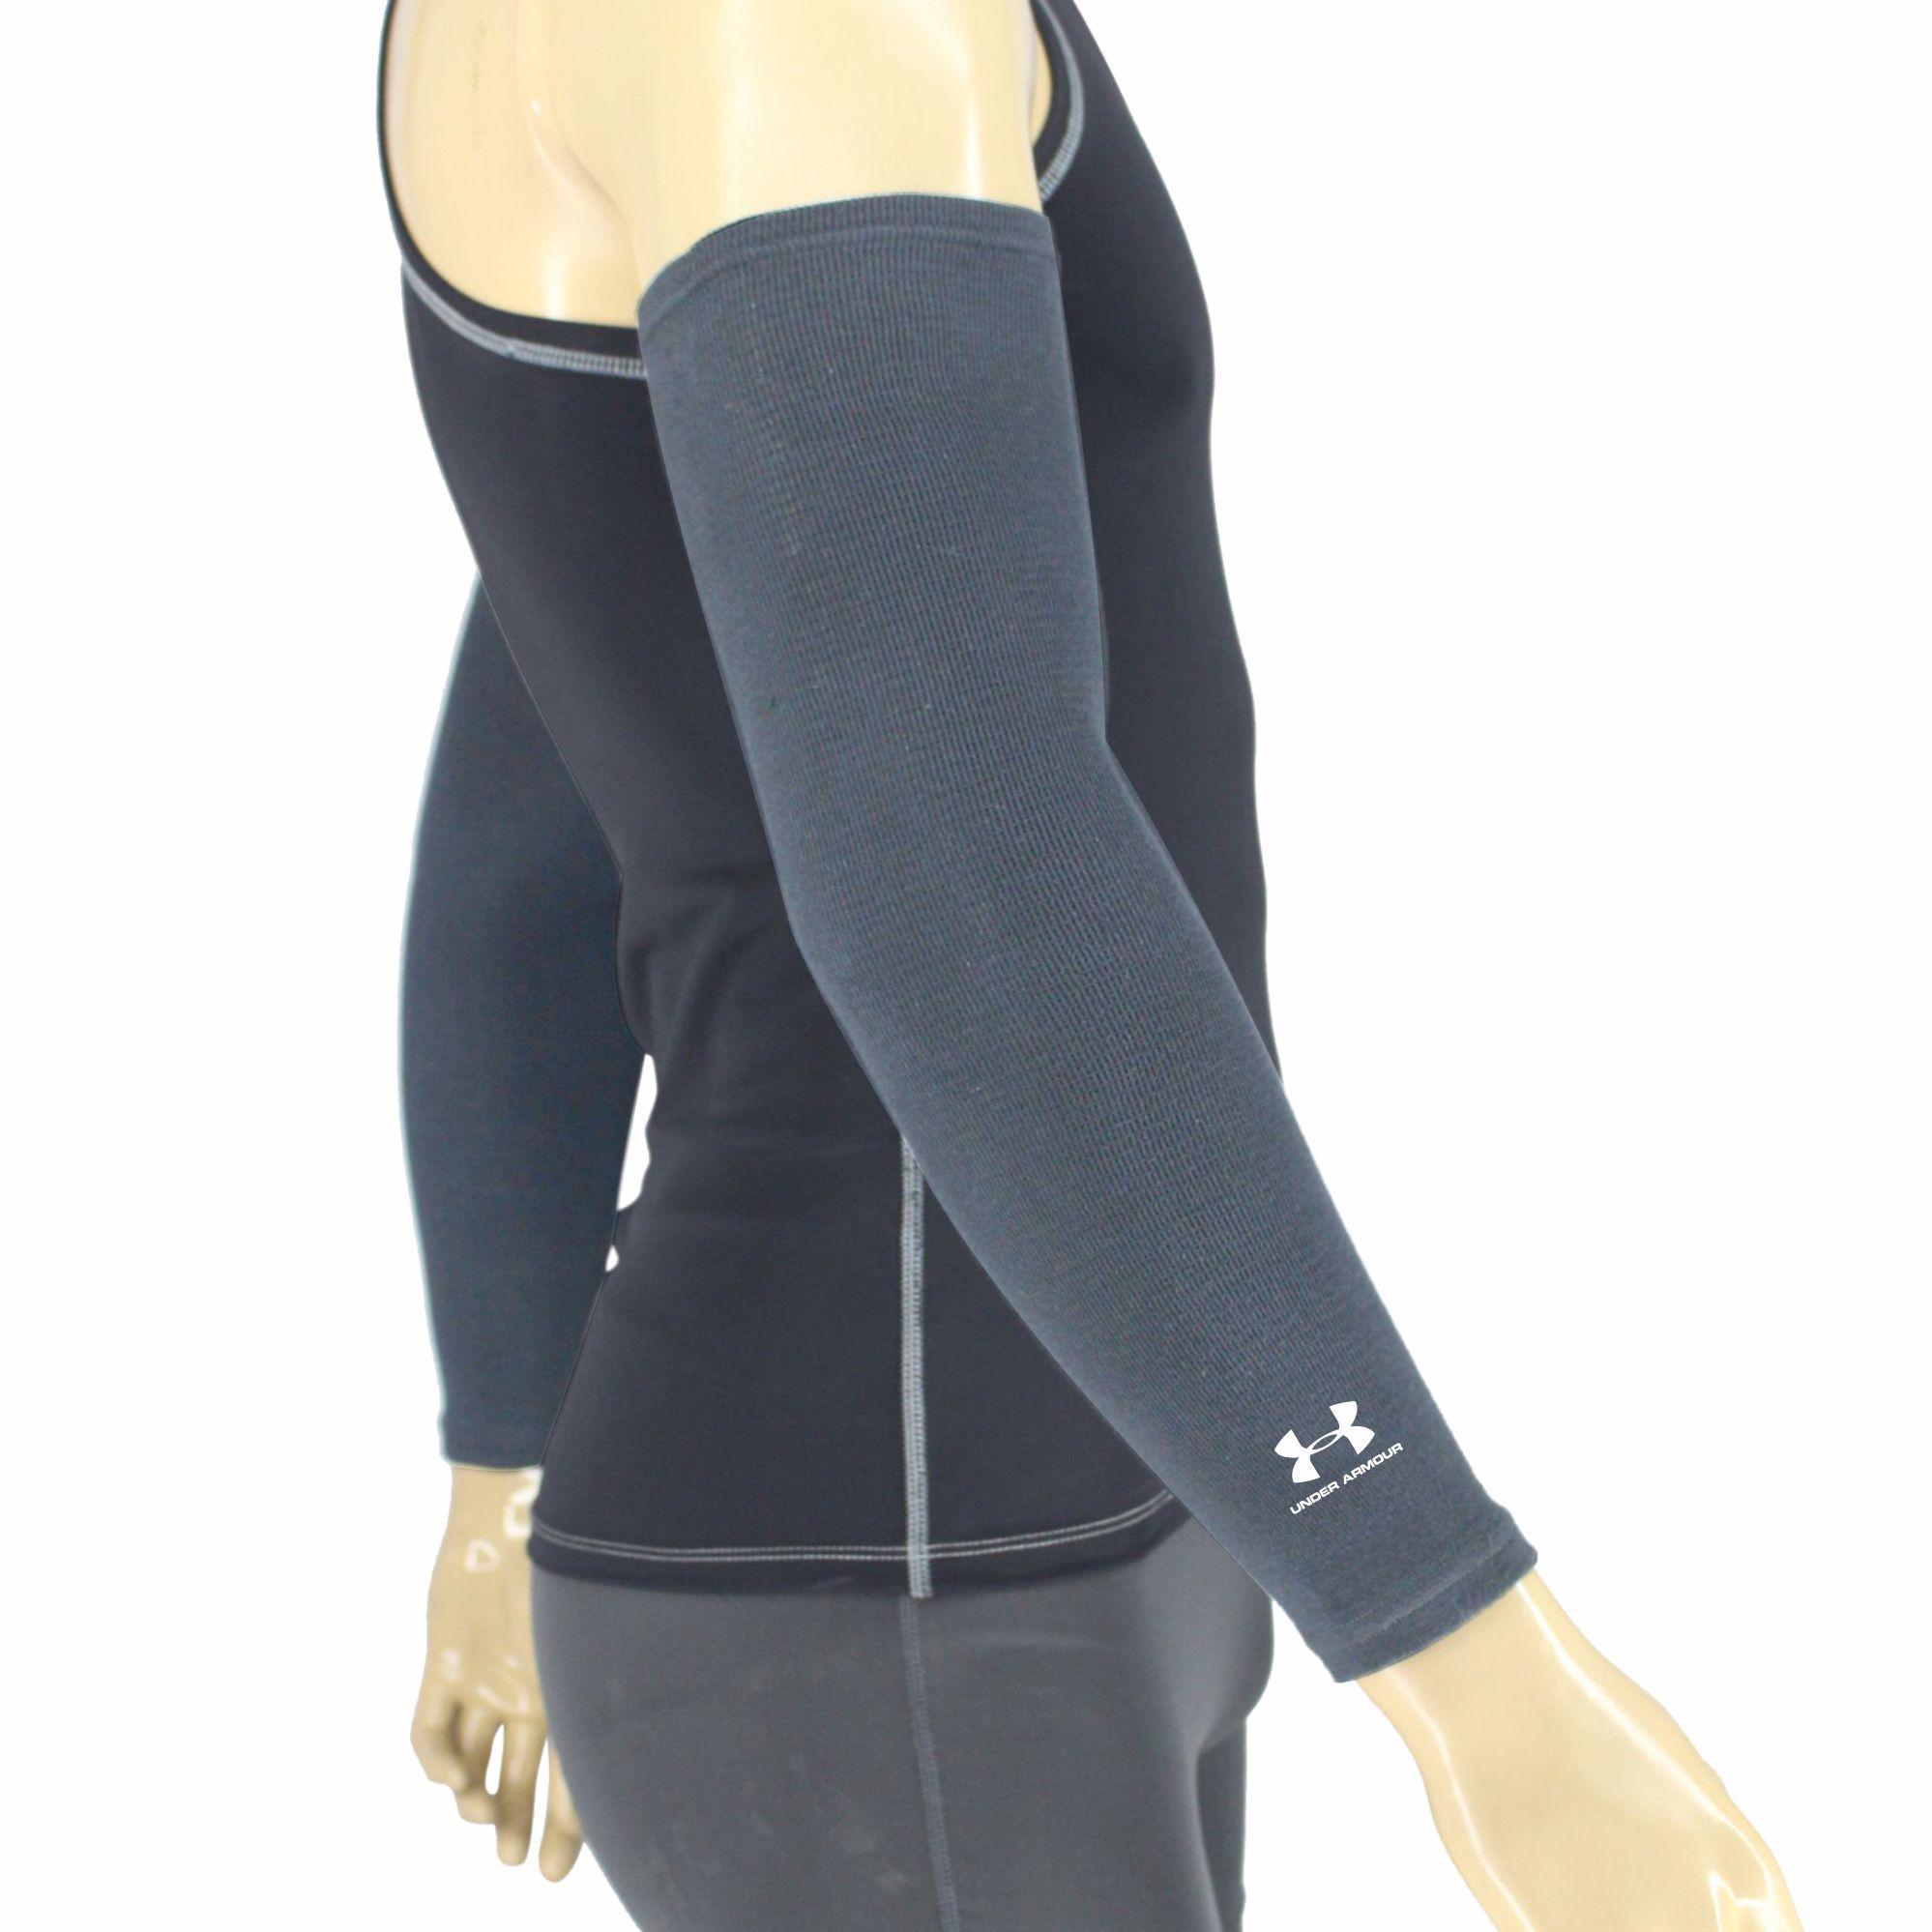 Rainorshine Ua18 Compression Arm Sleeves 2-Way Elastic Knitted Seamless Unisex Pair (2 Pcs) By Umbrella Rain Or Shine.